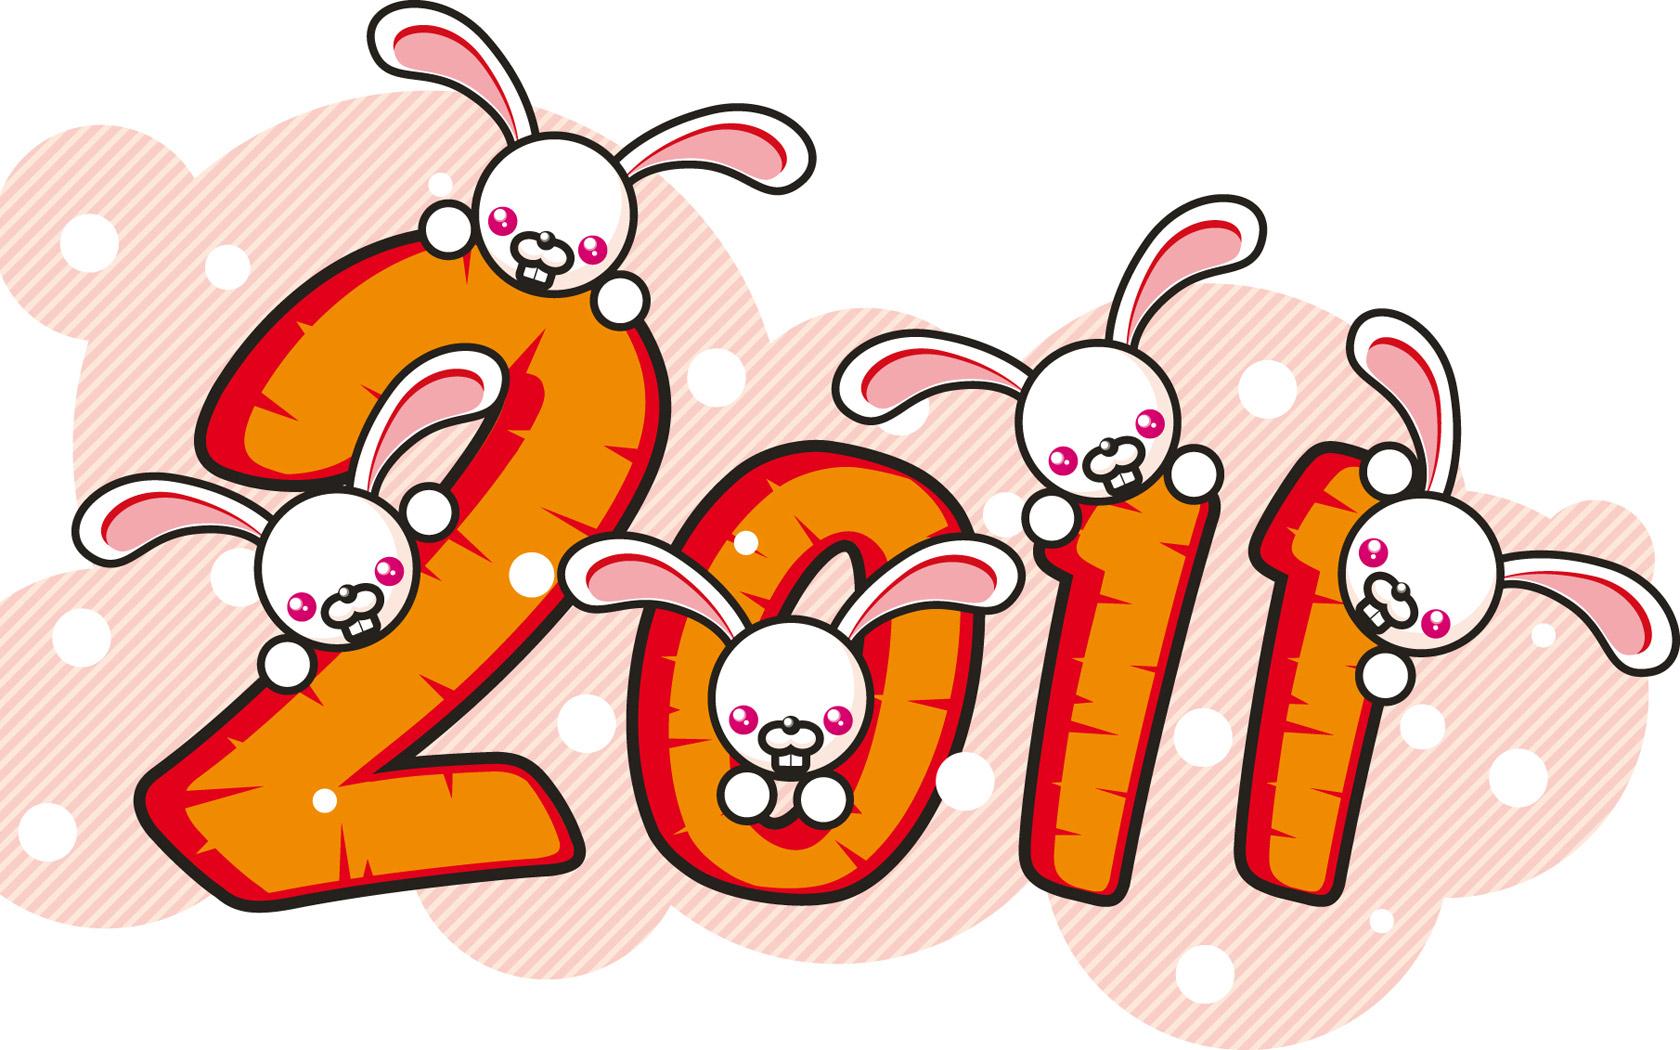 http://www.zastavki.com/pictures/1680x1050/2010/New_Year_2011_2011_year_Rabbit_026309_.jpg